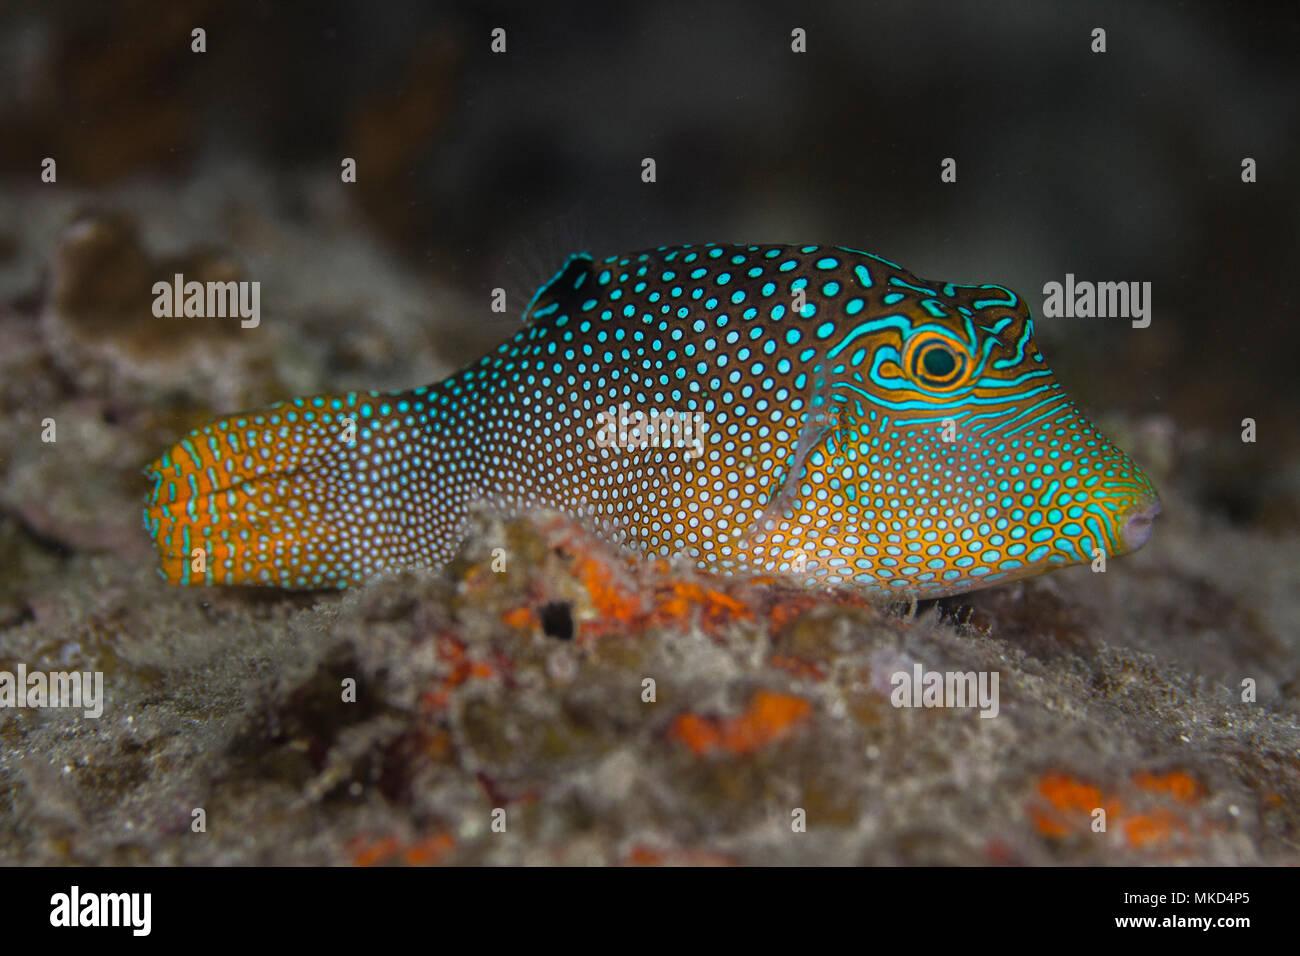 Vista lateral derecha de Toby (Canthigaster solandri manchado) en Arrecife, Tahití, Polinesia Francesa Foto de stock